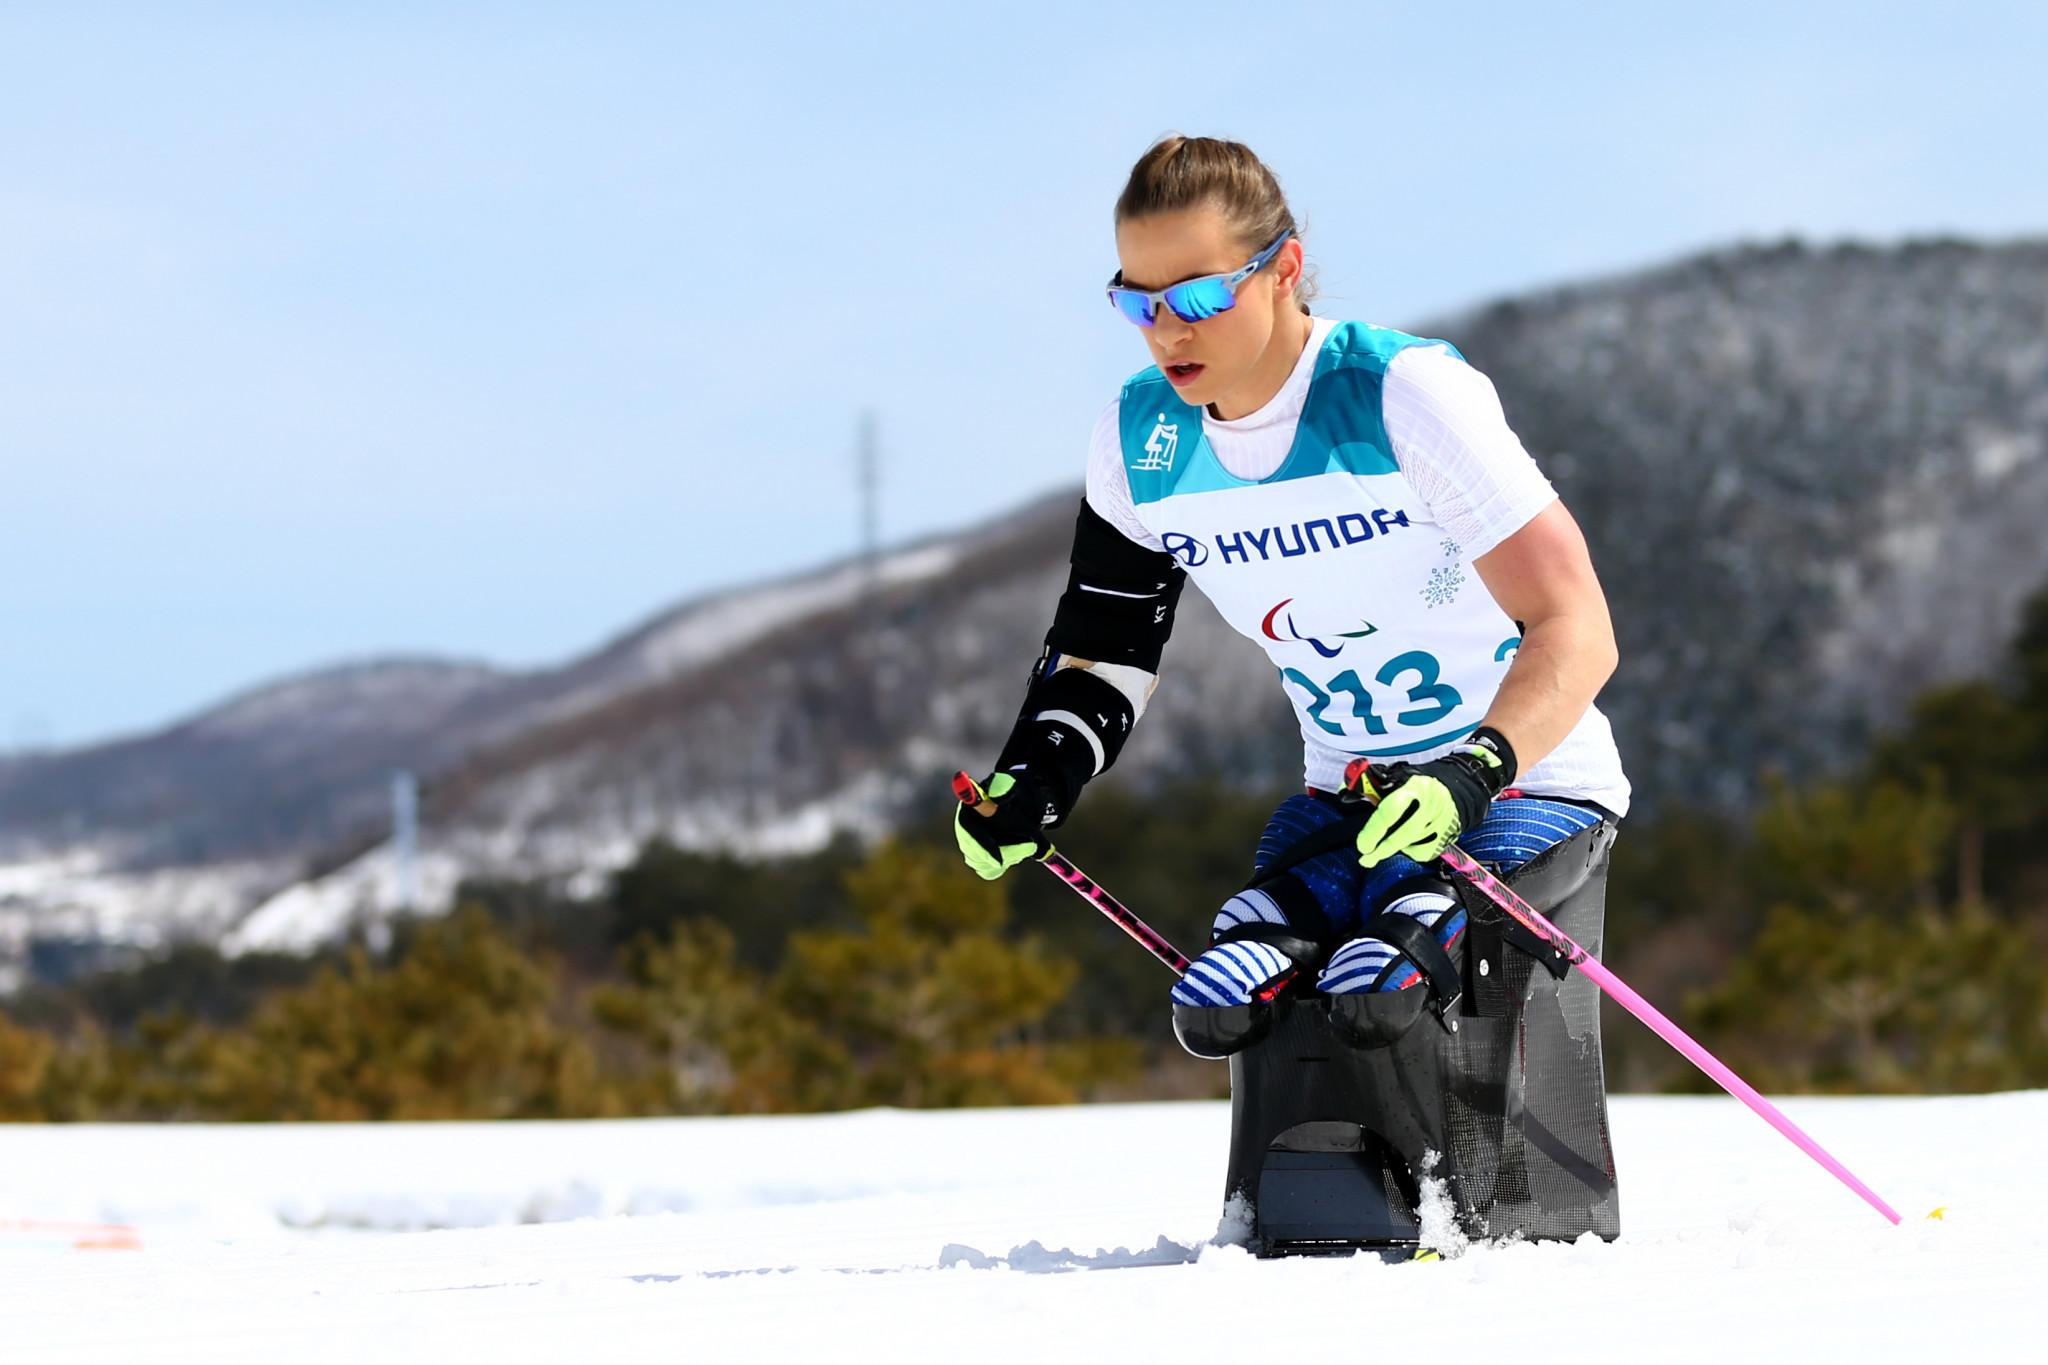 US Paralympics names national and development Nordic skiing teams for 2019-2020 season